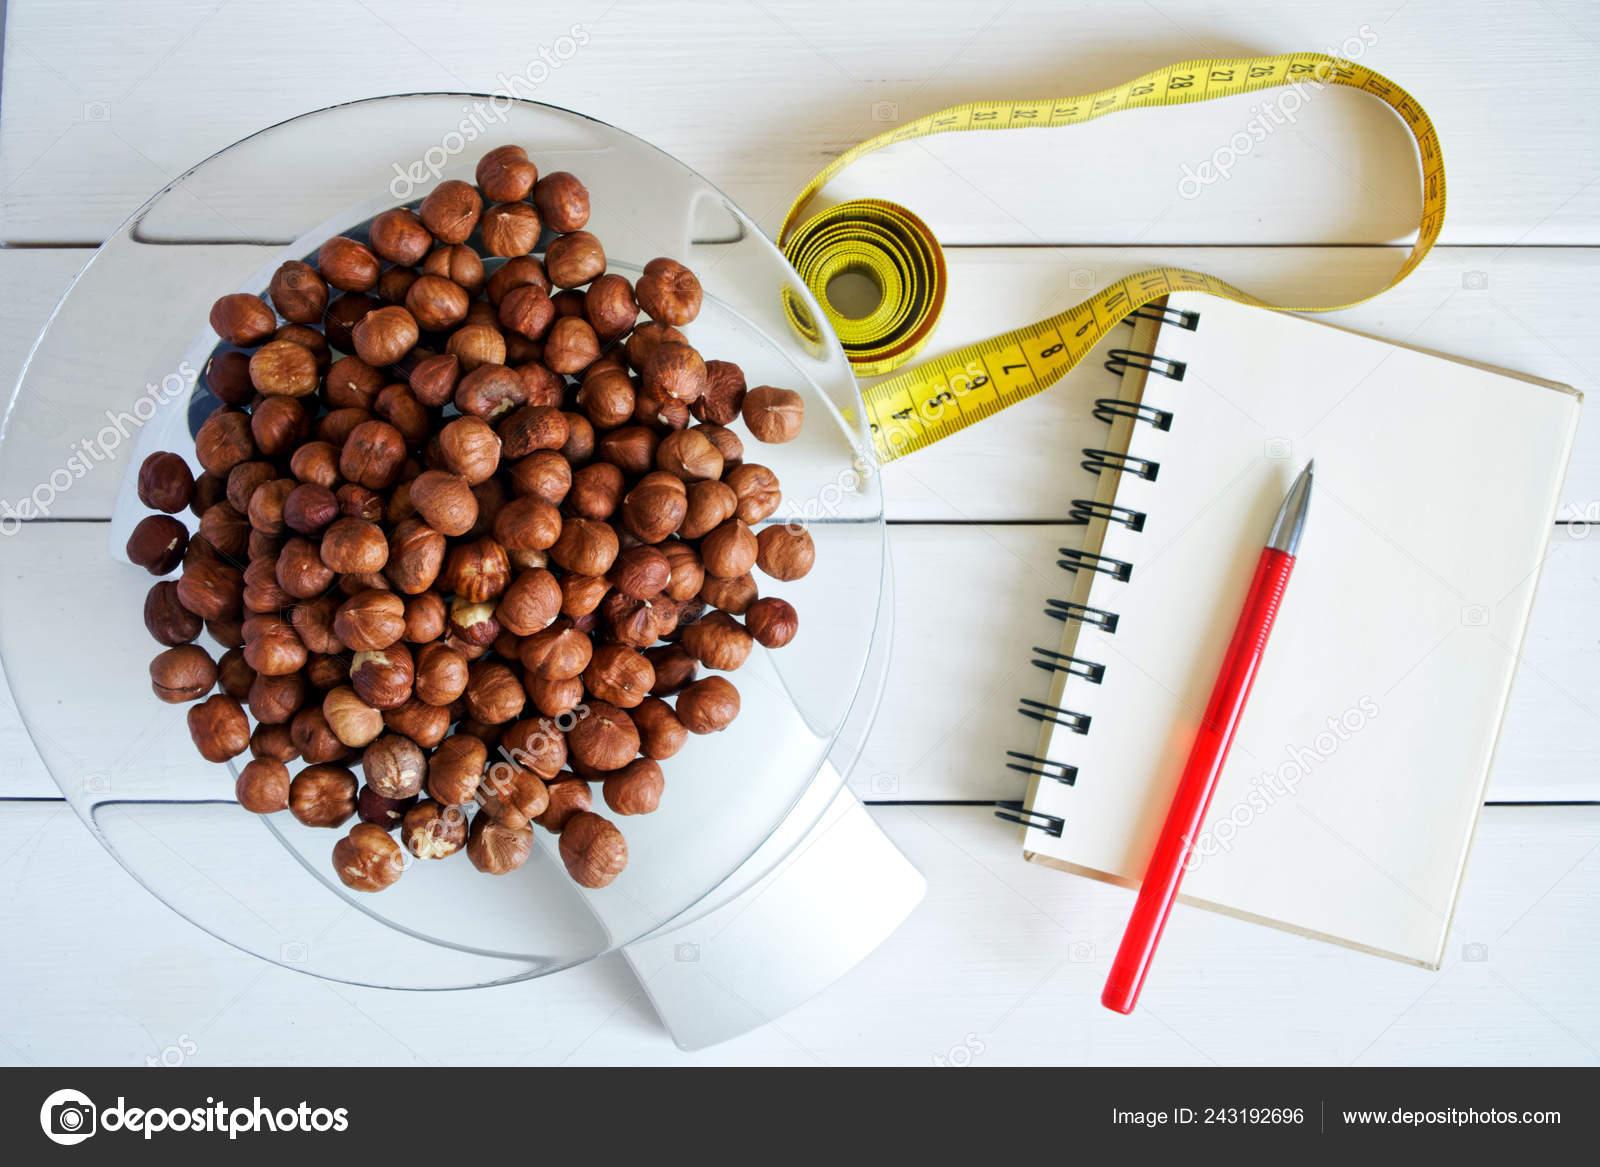 Кбжу (калории, белки, жиры, углеводы).